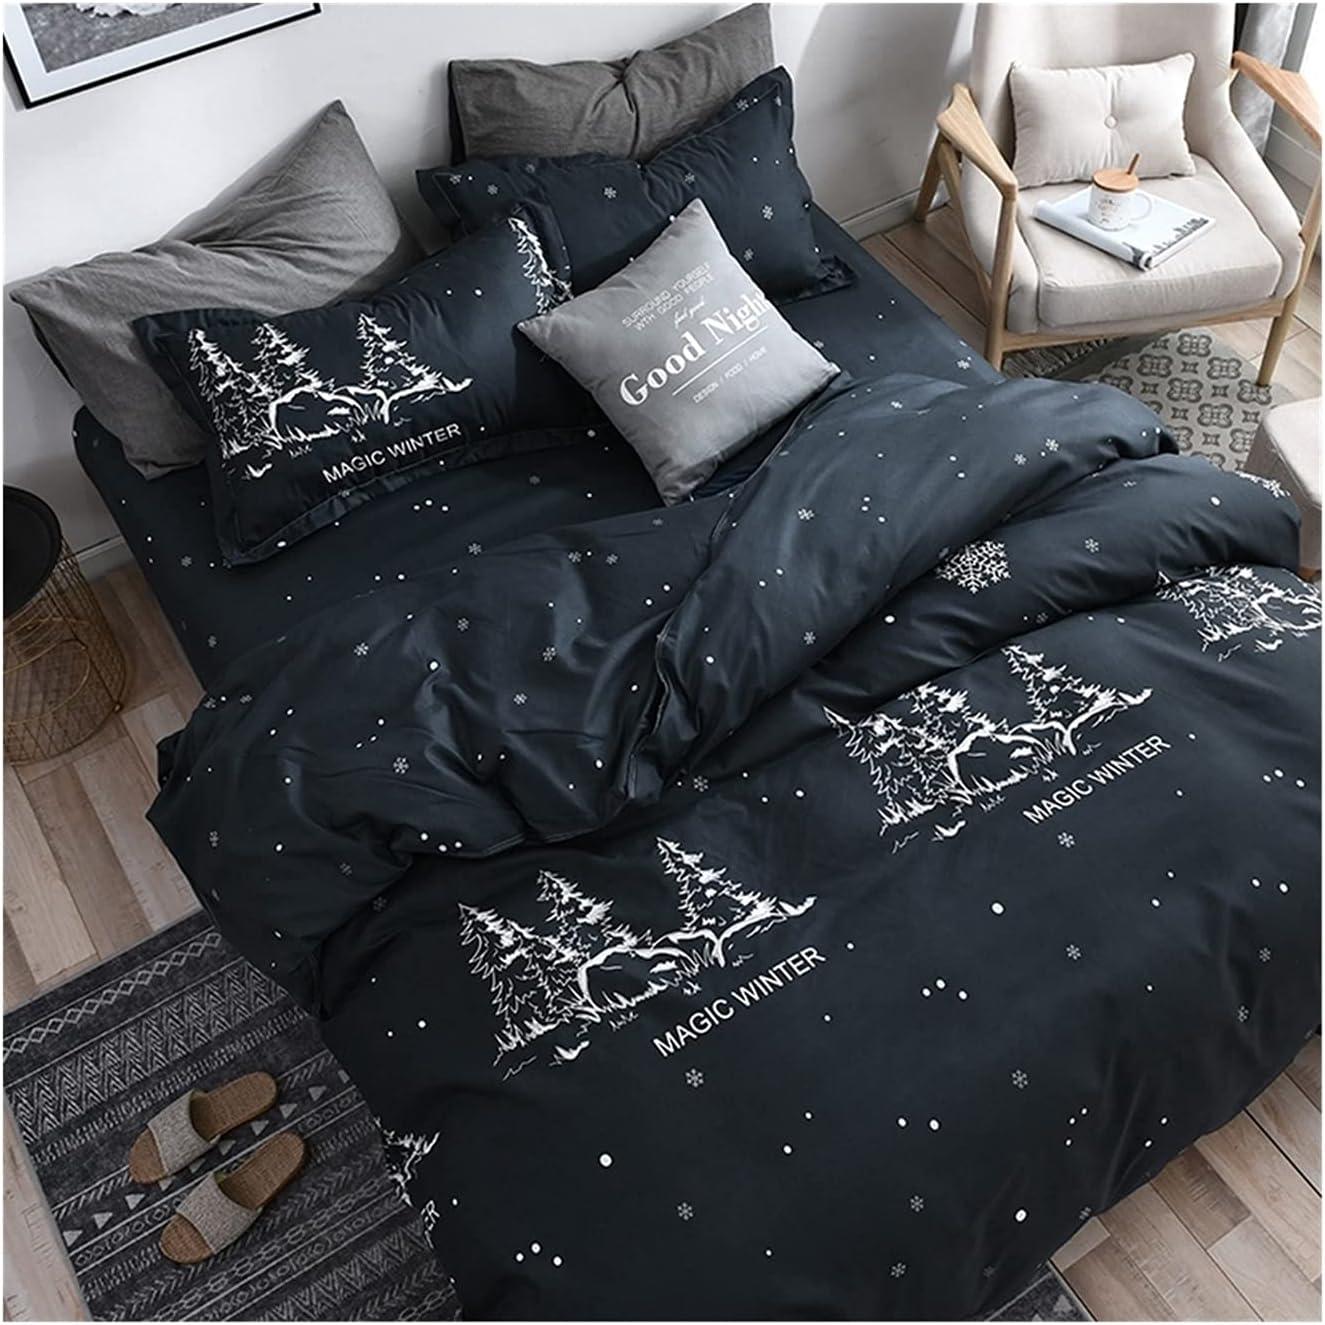 LSDJ QMDSH Home Max 49% OFF Textile Girl Bedding Overseas parallel import regular item Set Cover Peach Pink Duvet